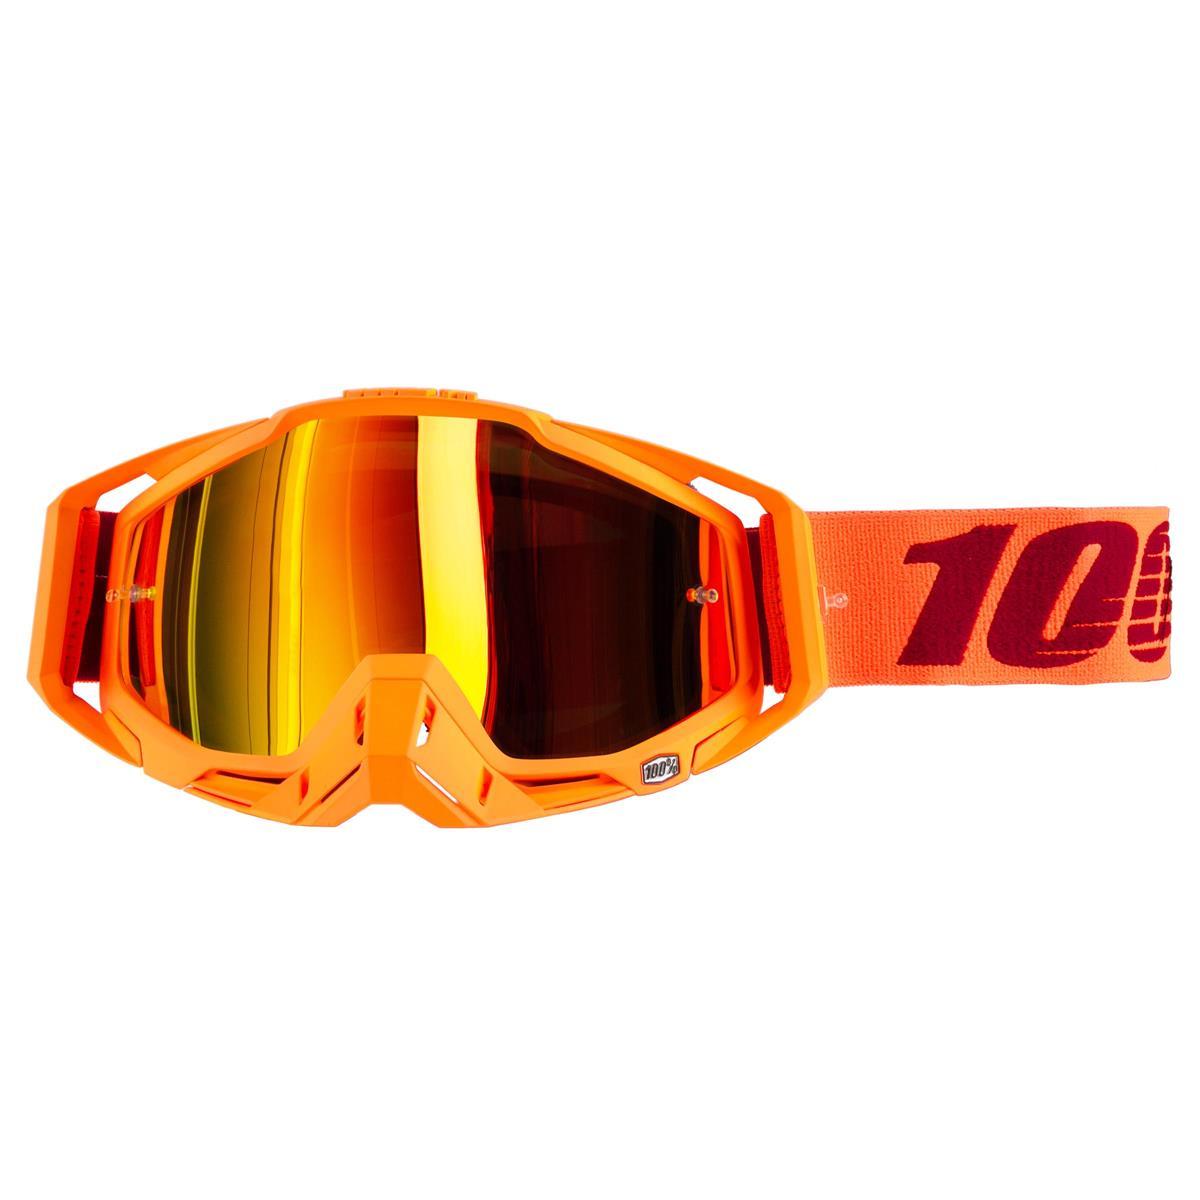 100% Goggle The Racecraft Menlo - Mirror Gold Anti-Fog